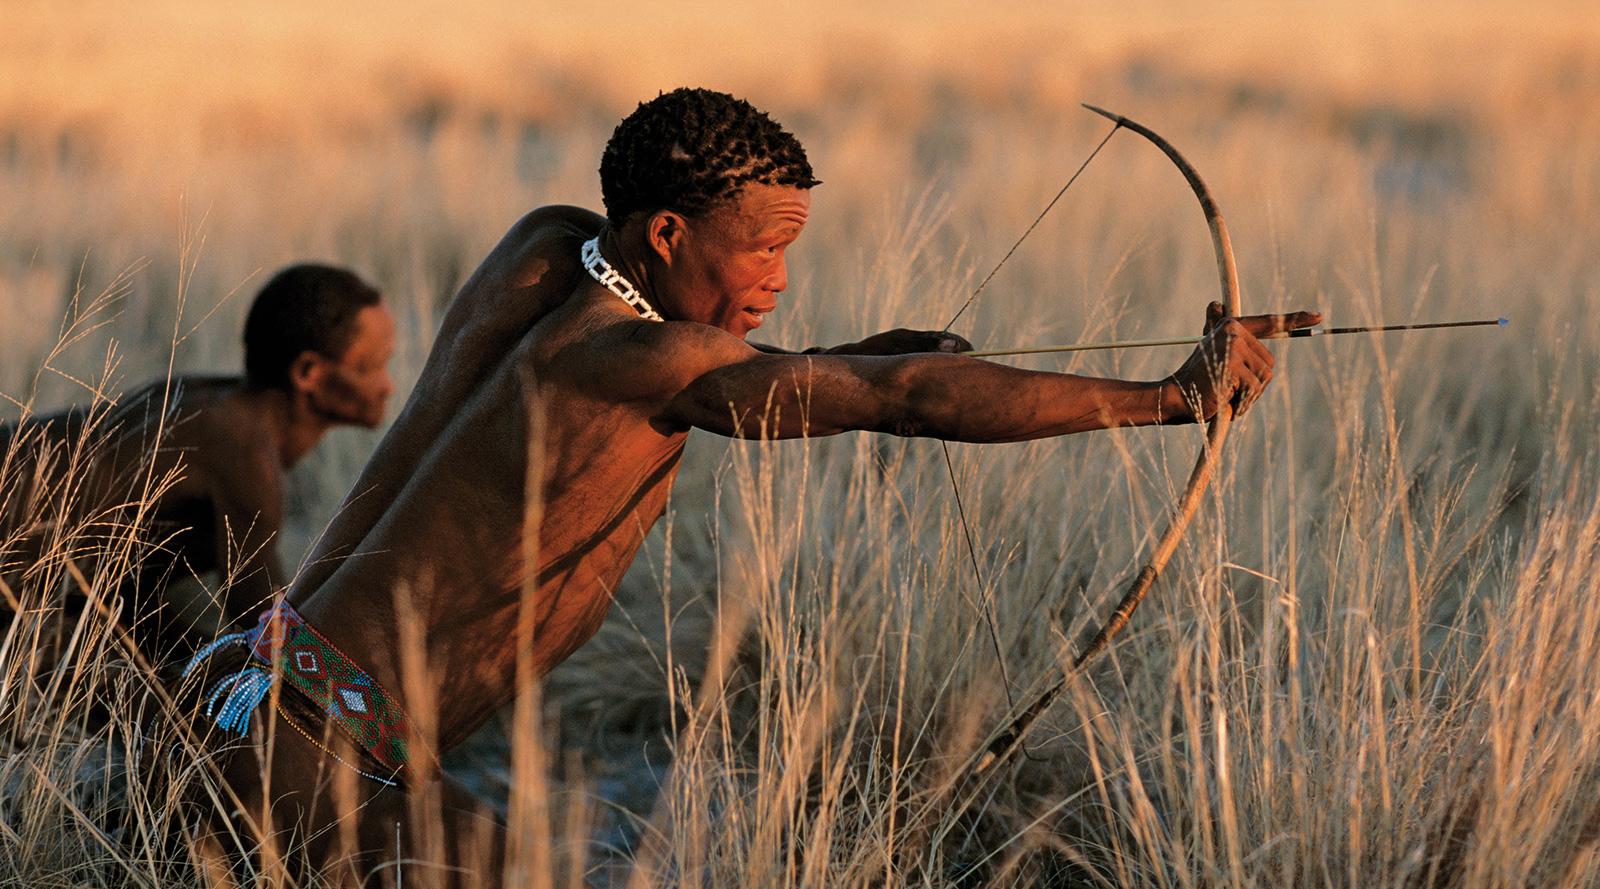 © Image courtesy of Uncharted Africa Safari co. | Bushmen